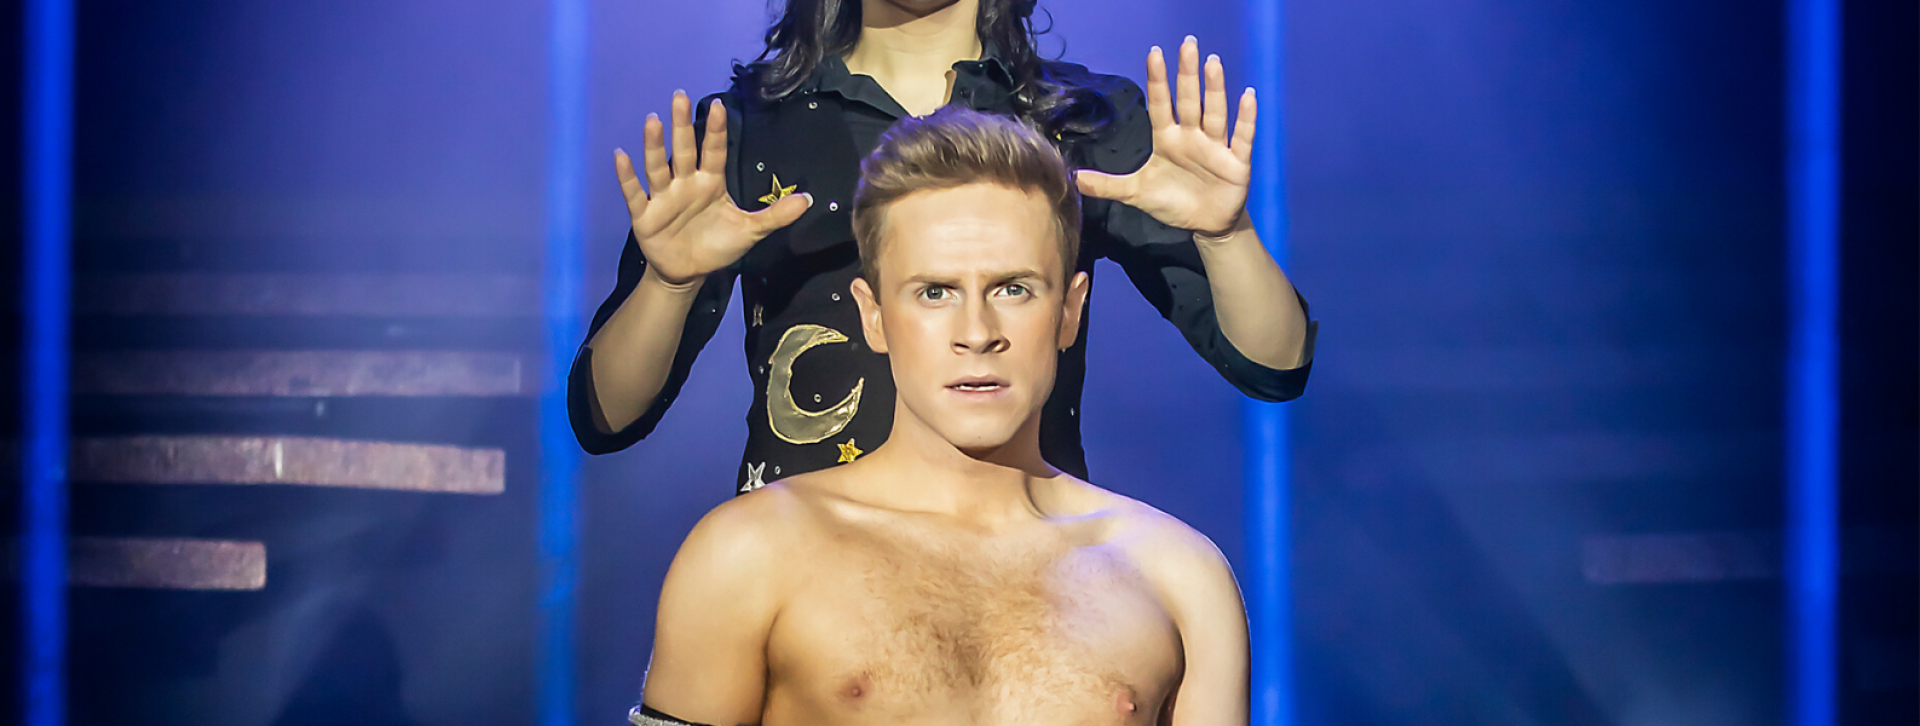 Britain's Got Talent sensation Mark McMullan makes his Musical Theatre debut